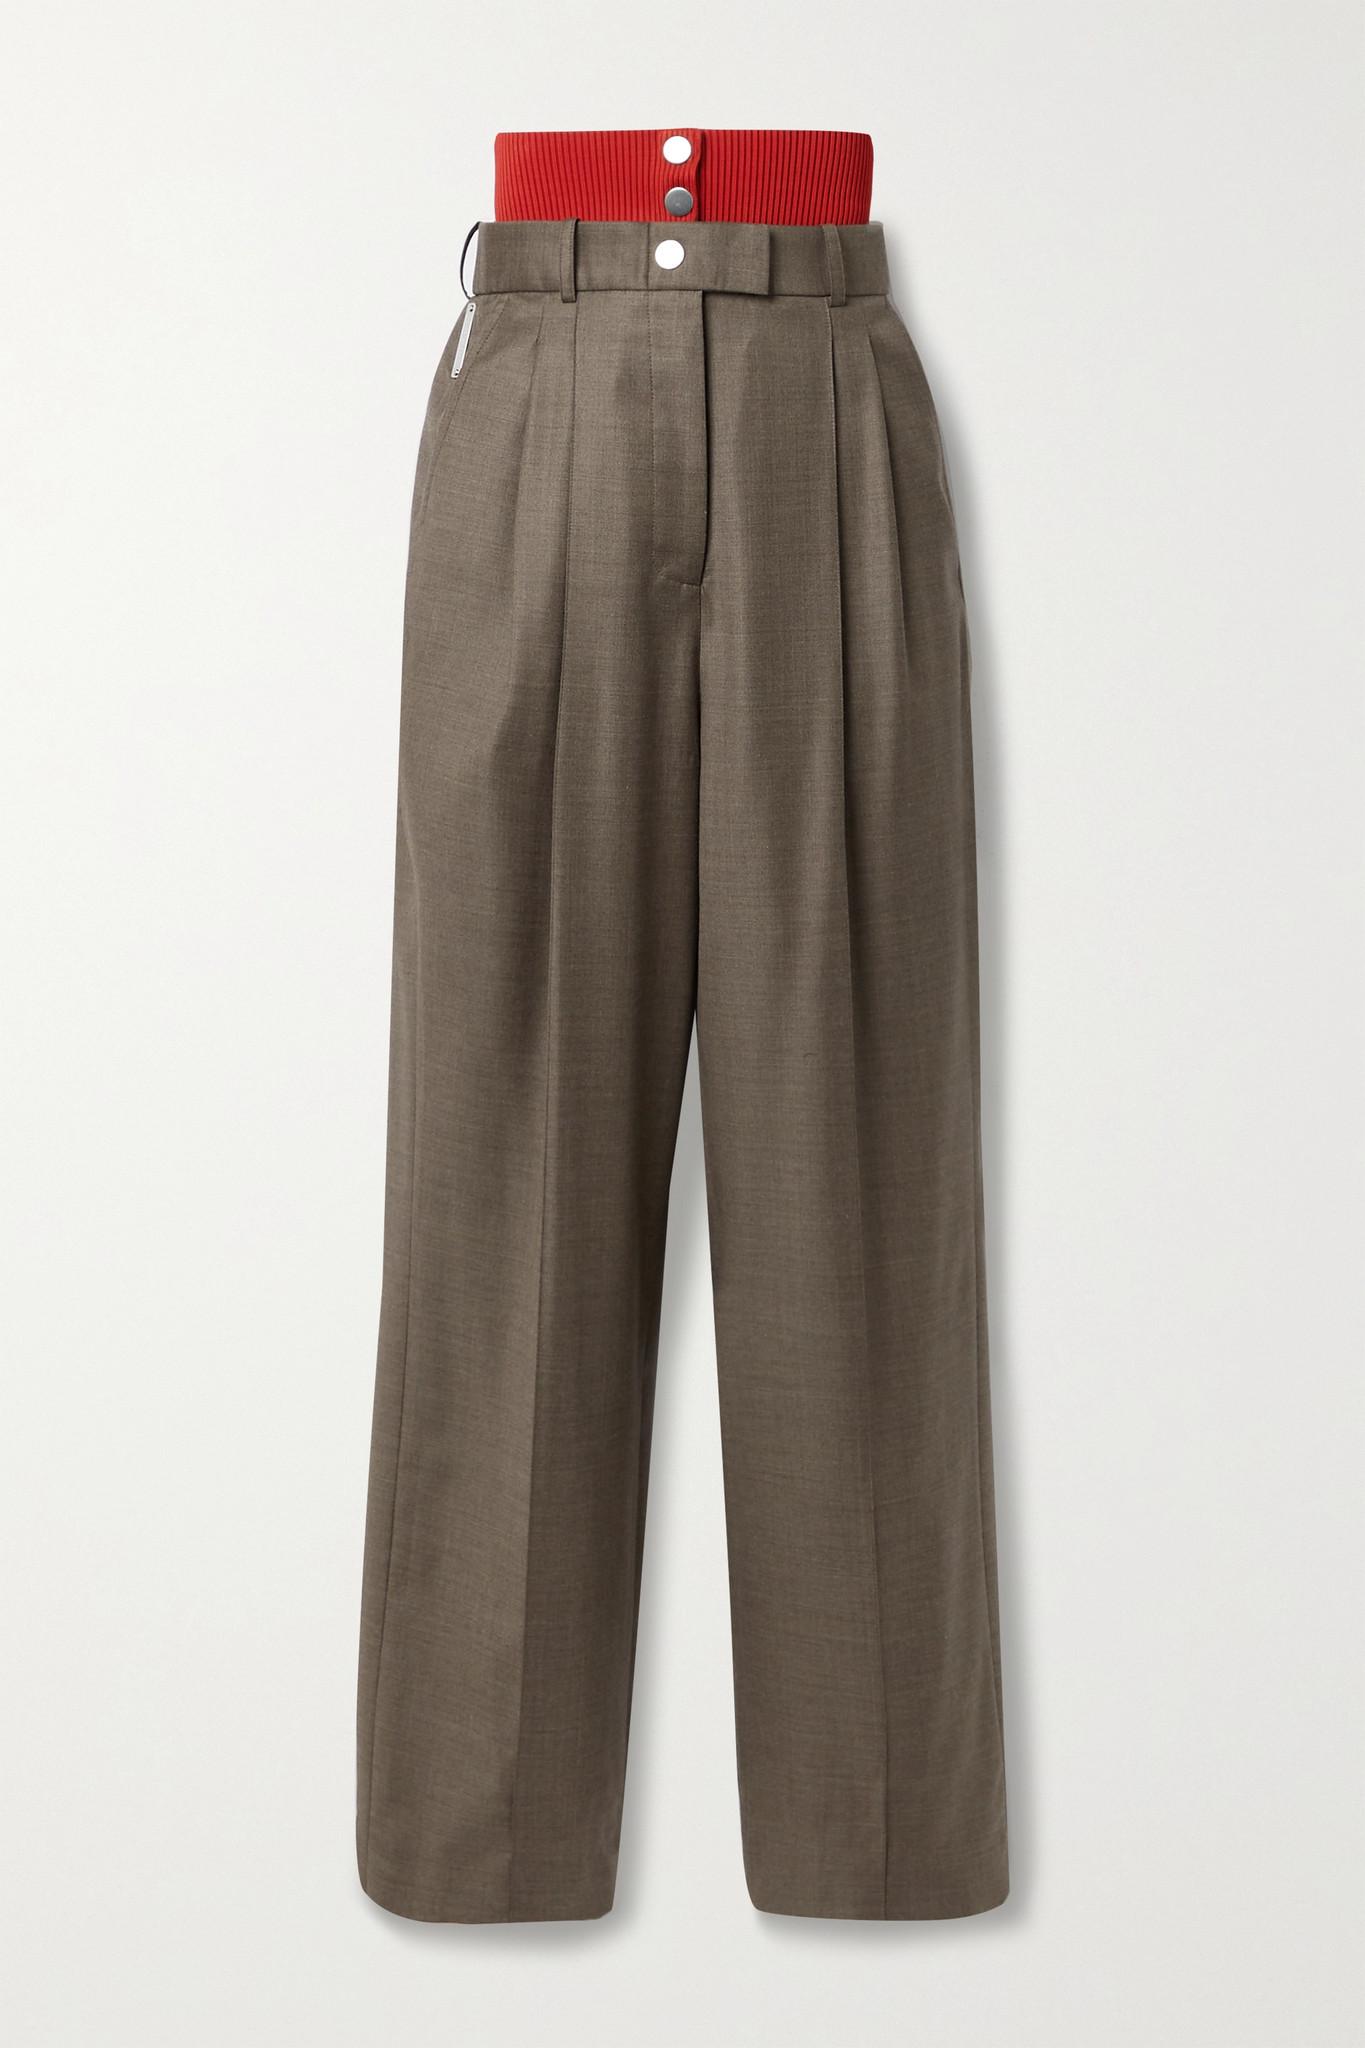 PETER DO - 罗纹针织边饰羊毛直筒裤 - 中性色 - FR36